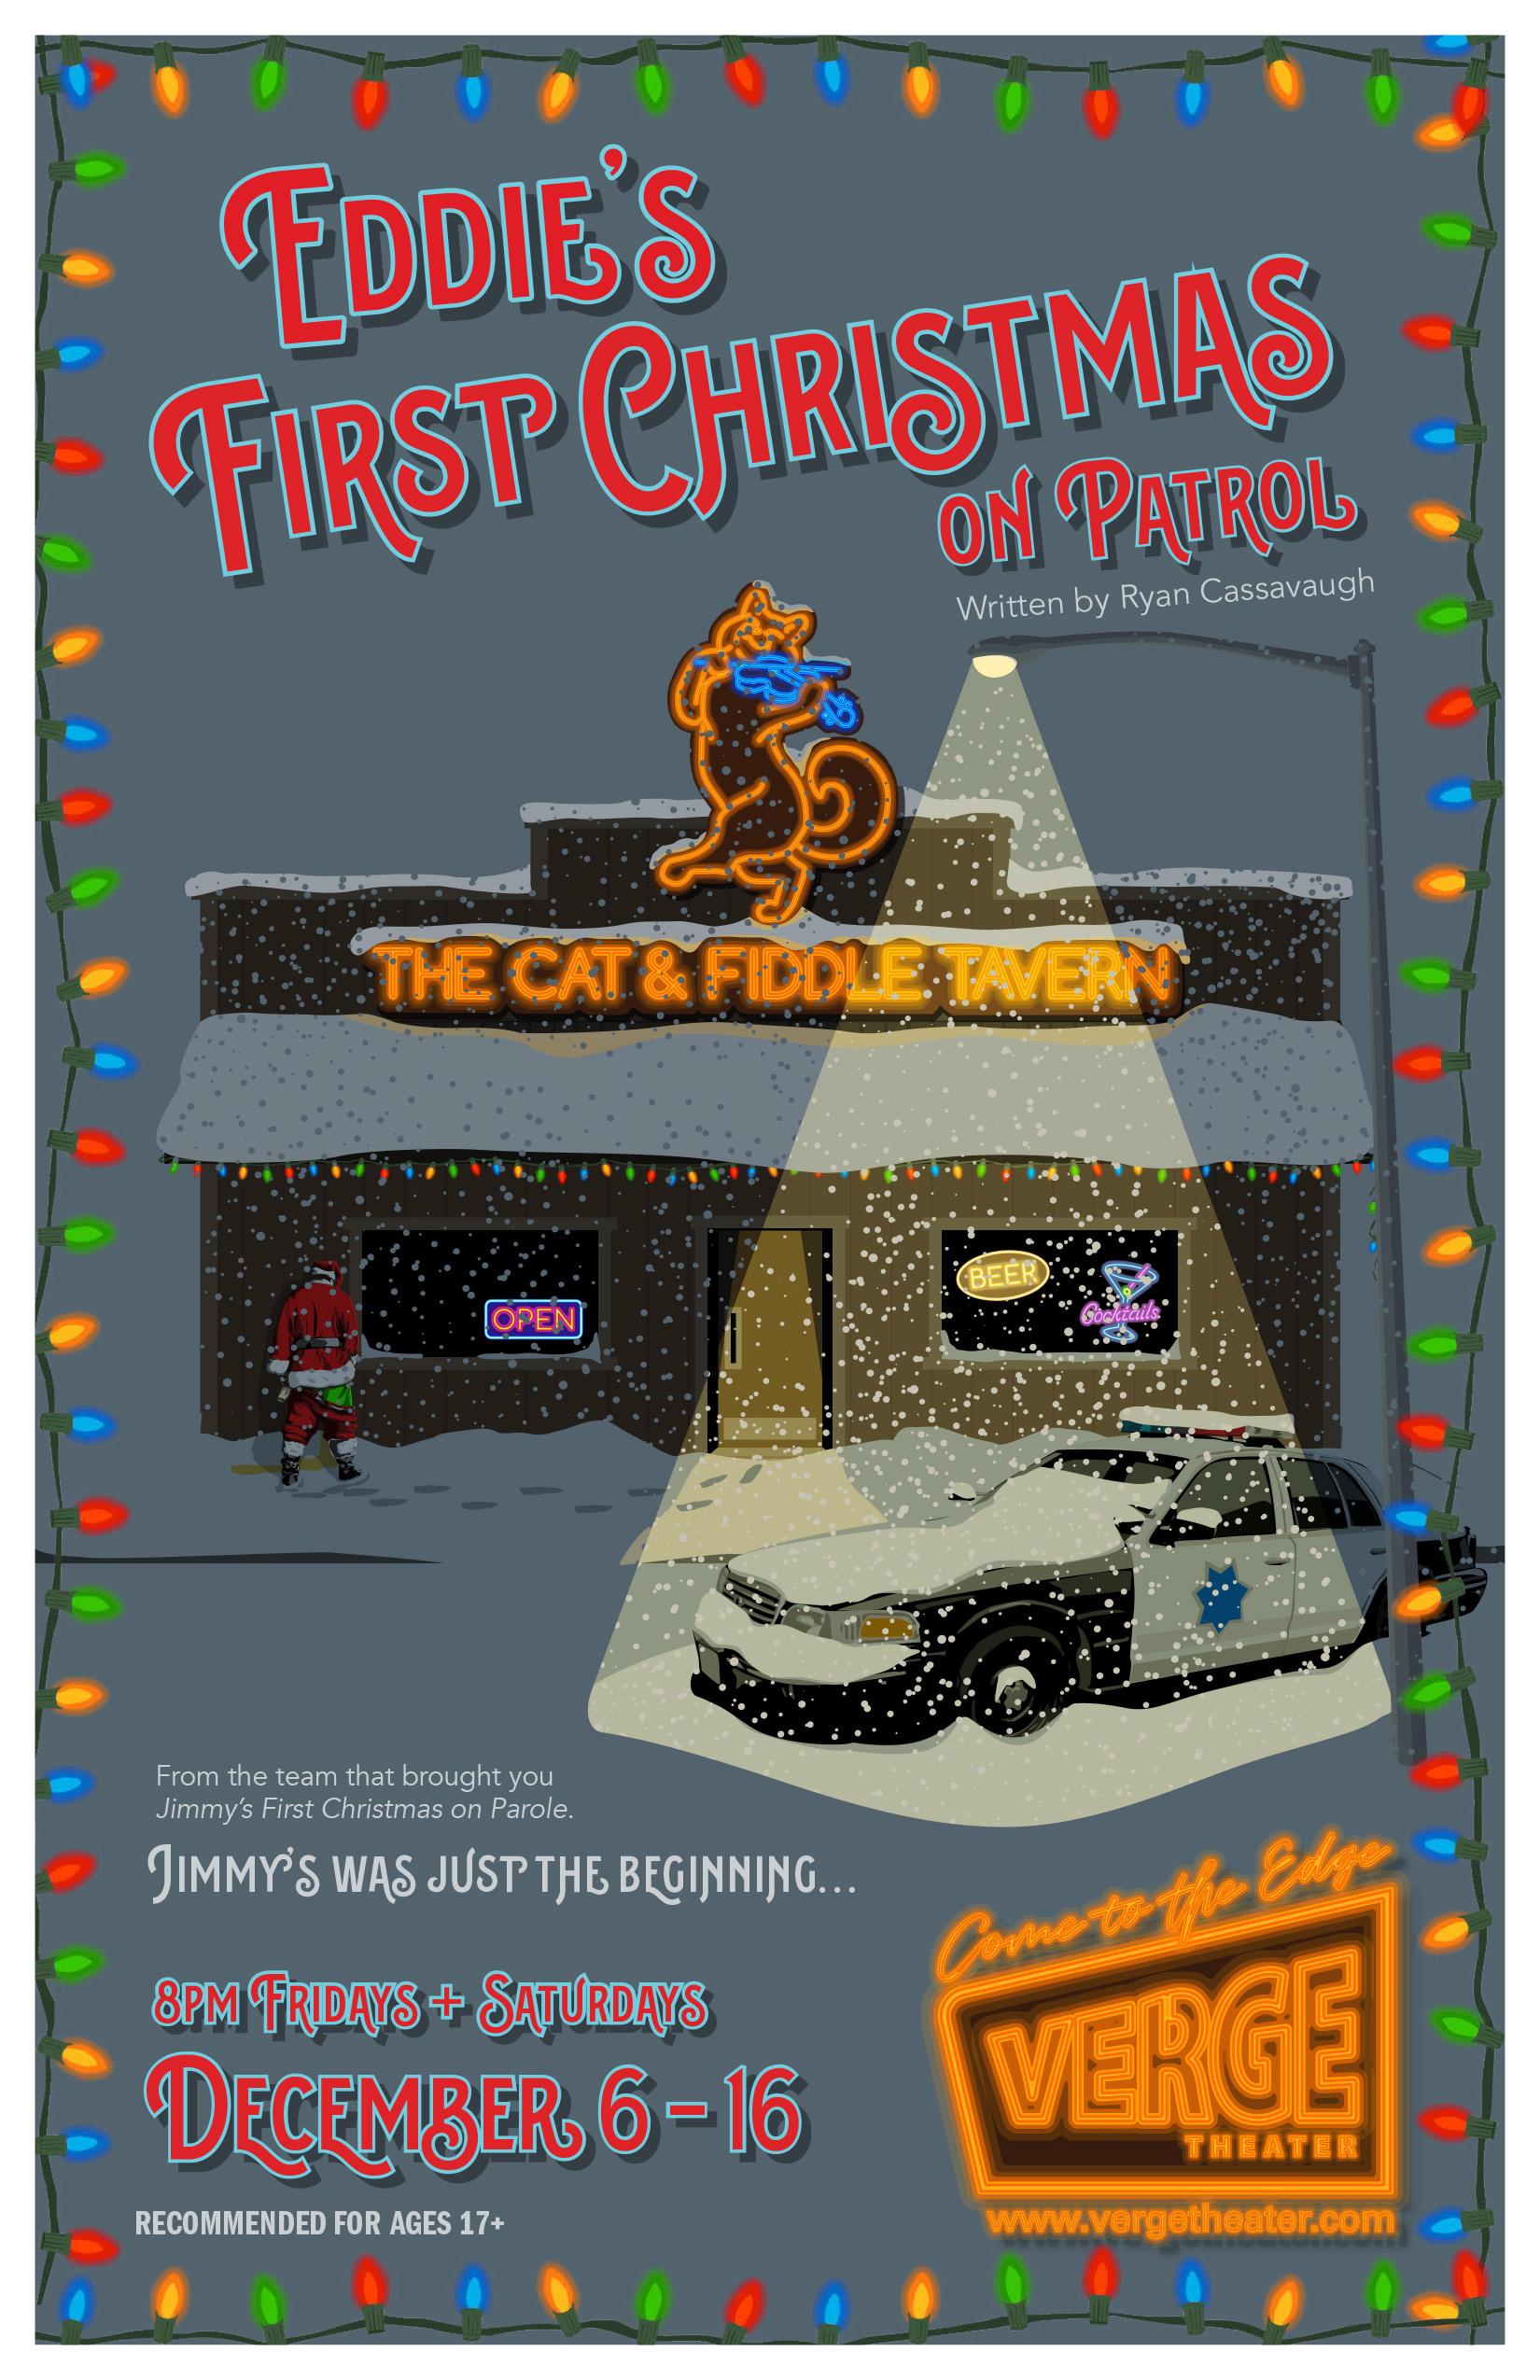 Eddies First Christmas on Patrol Poster for website.jpg